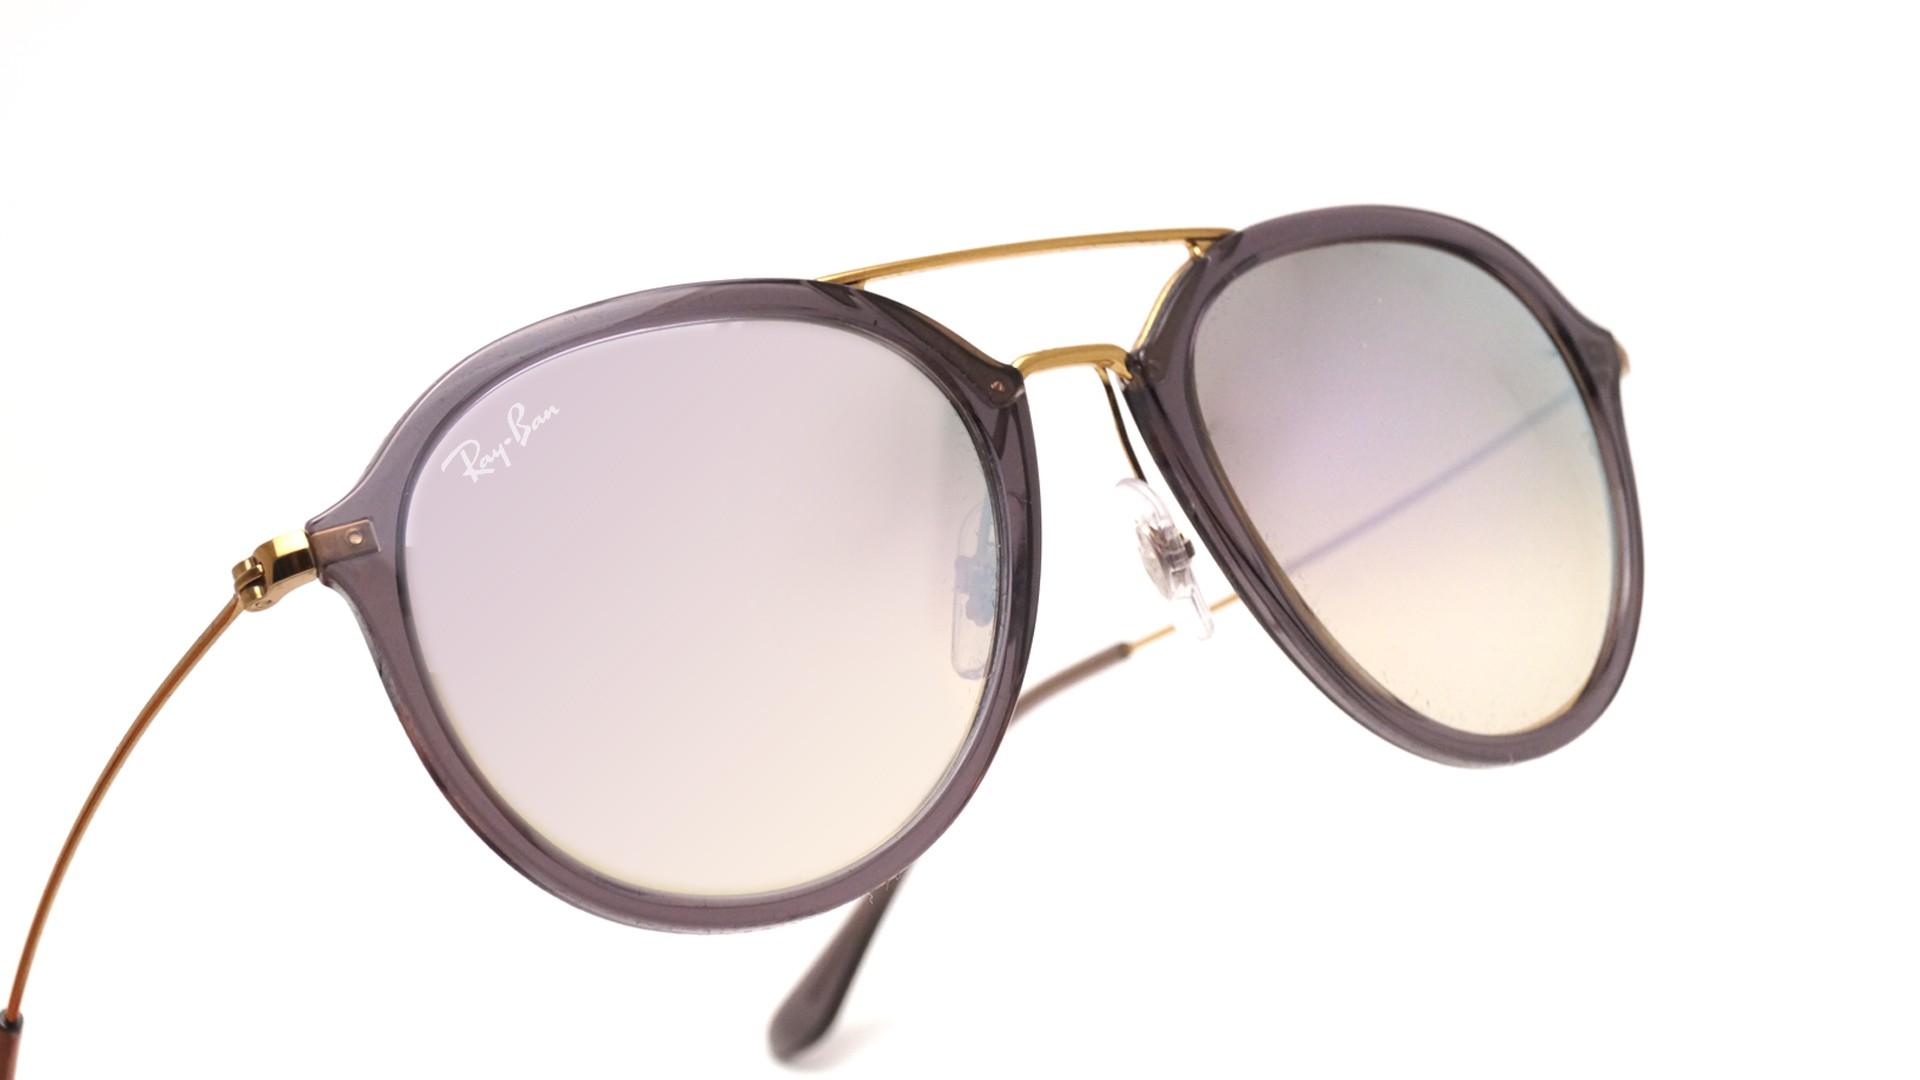 e0b68a5c0 Sunglasses Ray-Ban RB4253 62377X 53-21 Grey Medium Degraded Flash